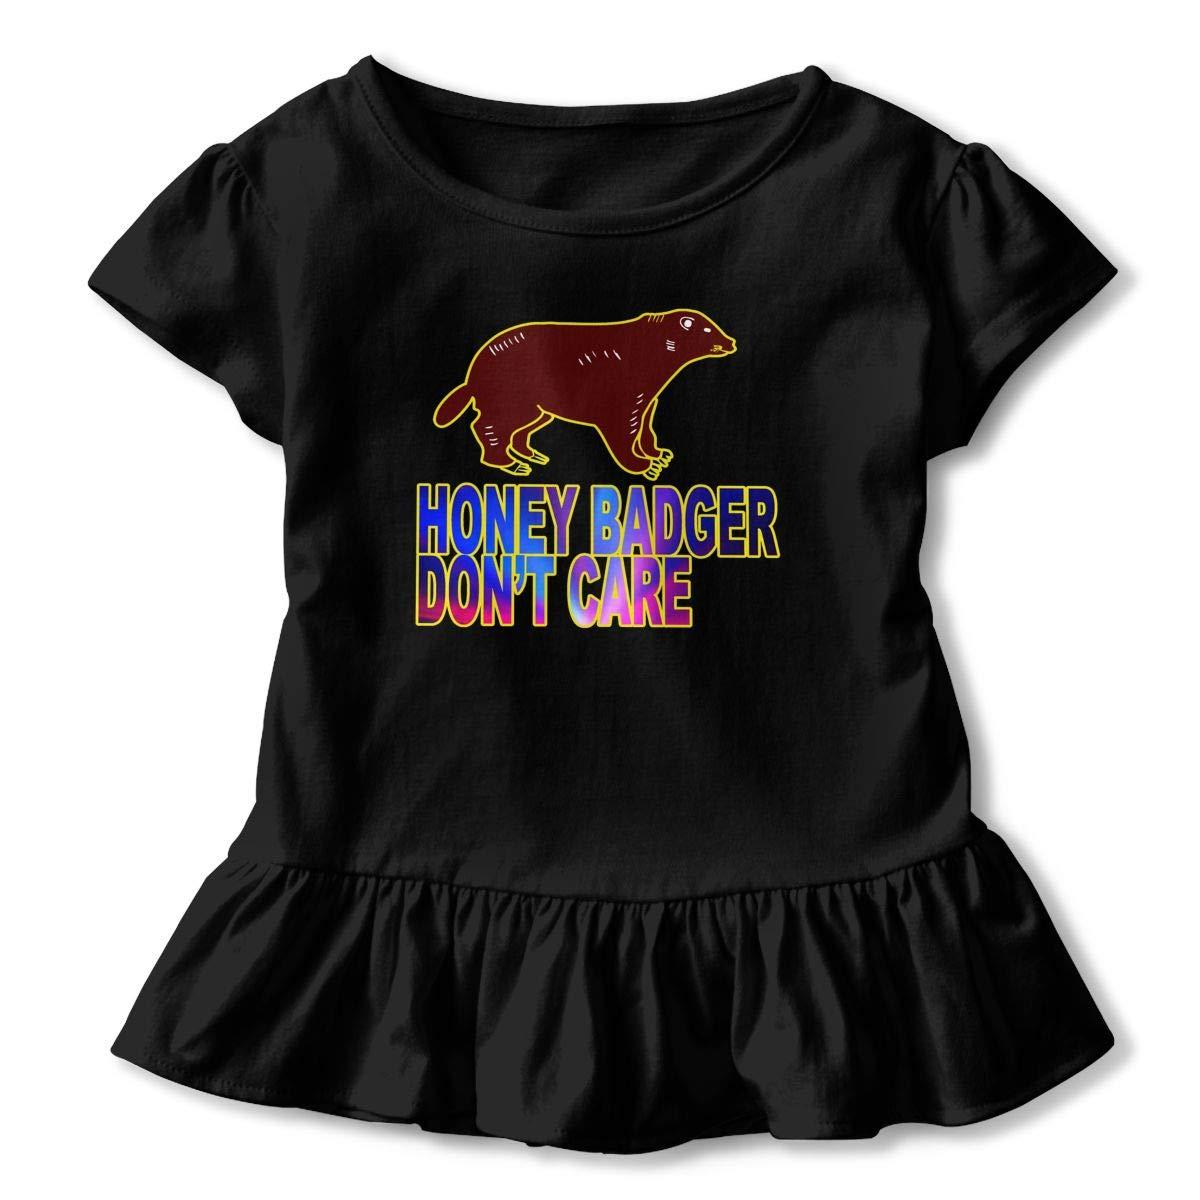 Honey Badger Don T Care Toddler Baby Girl Ruffle Short Sleeve T-Shirt Cute Cotton T Shirts